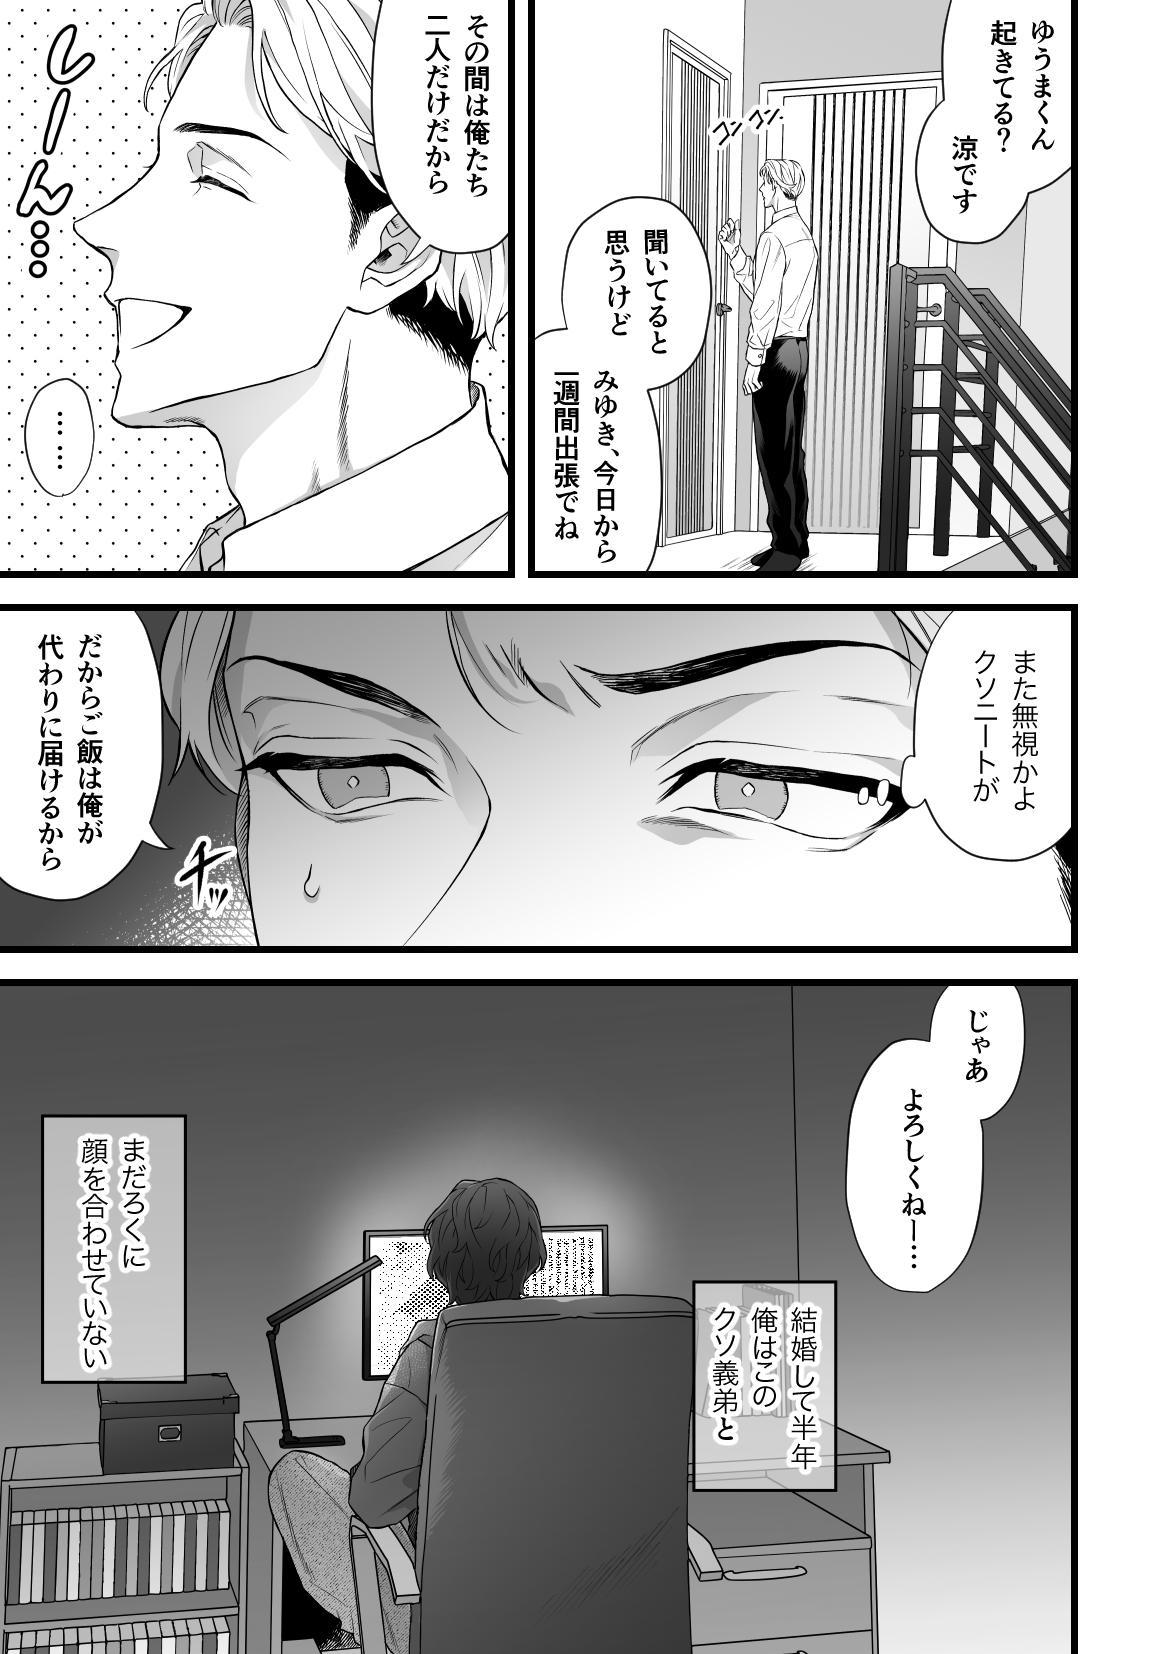 Gikei Ryoujoku 2